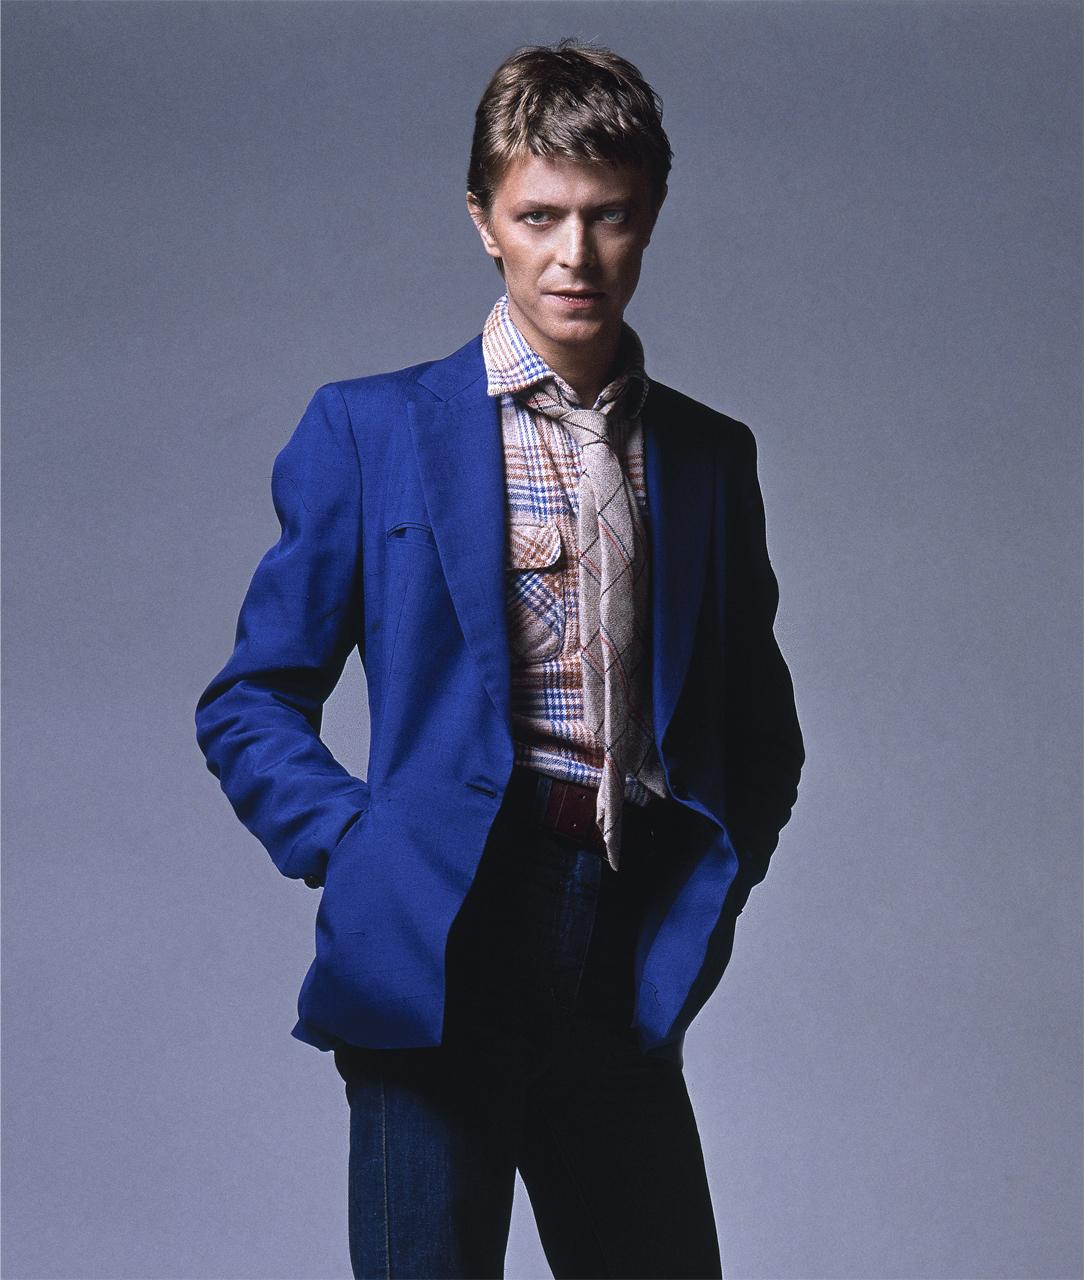 8.David-Bowie.Blue-Jacket.dps.jpg